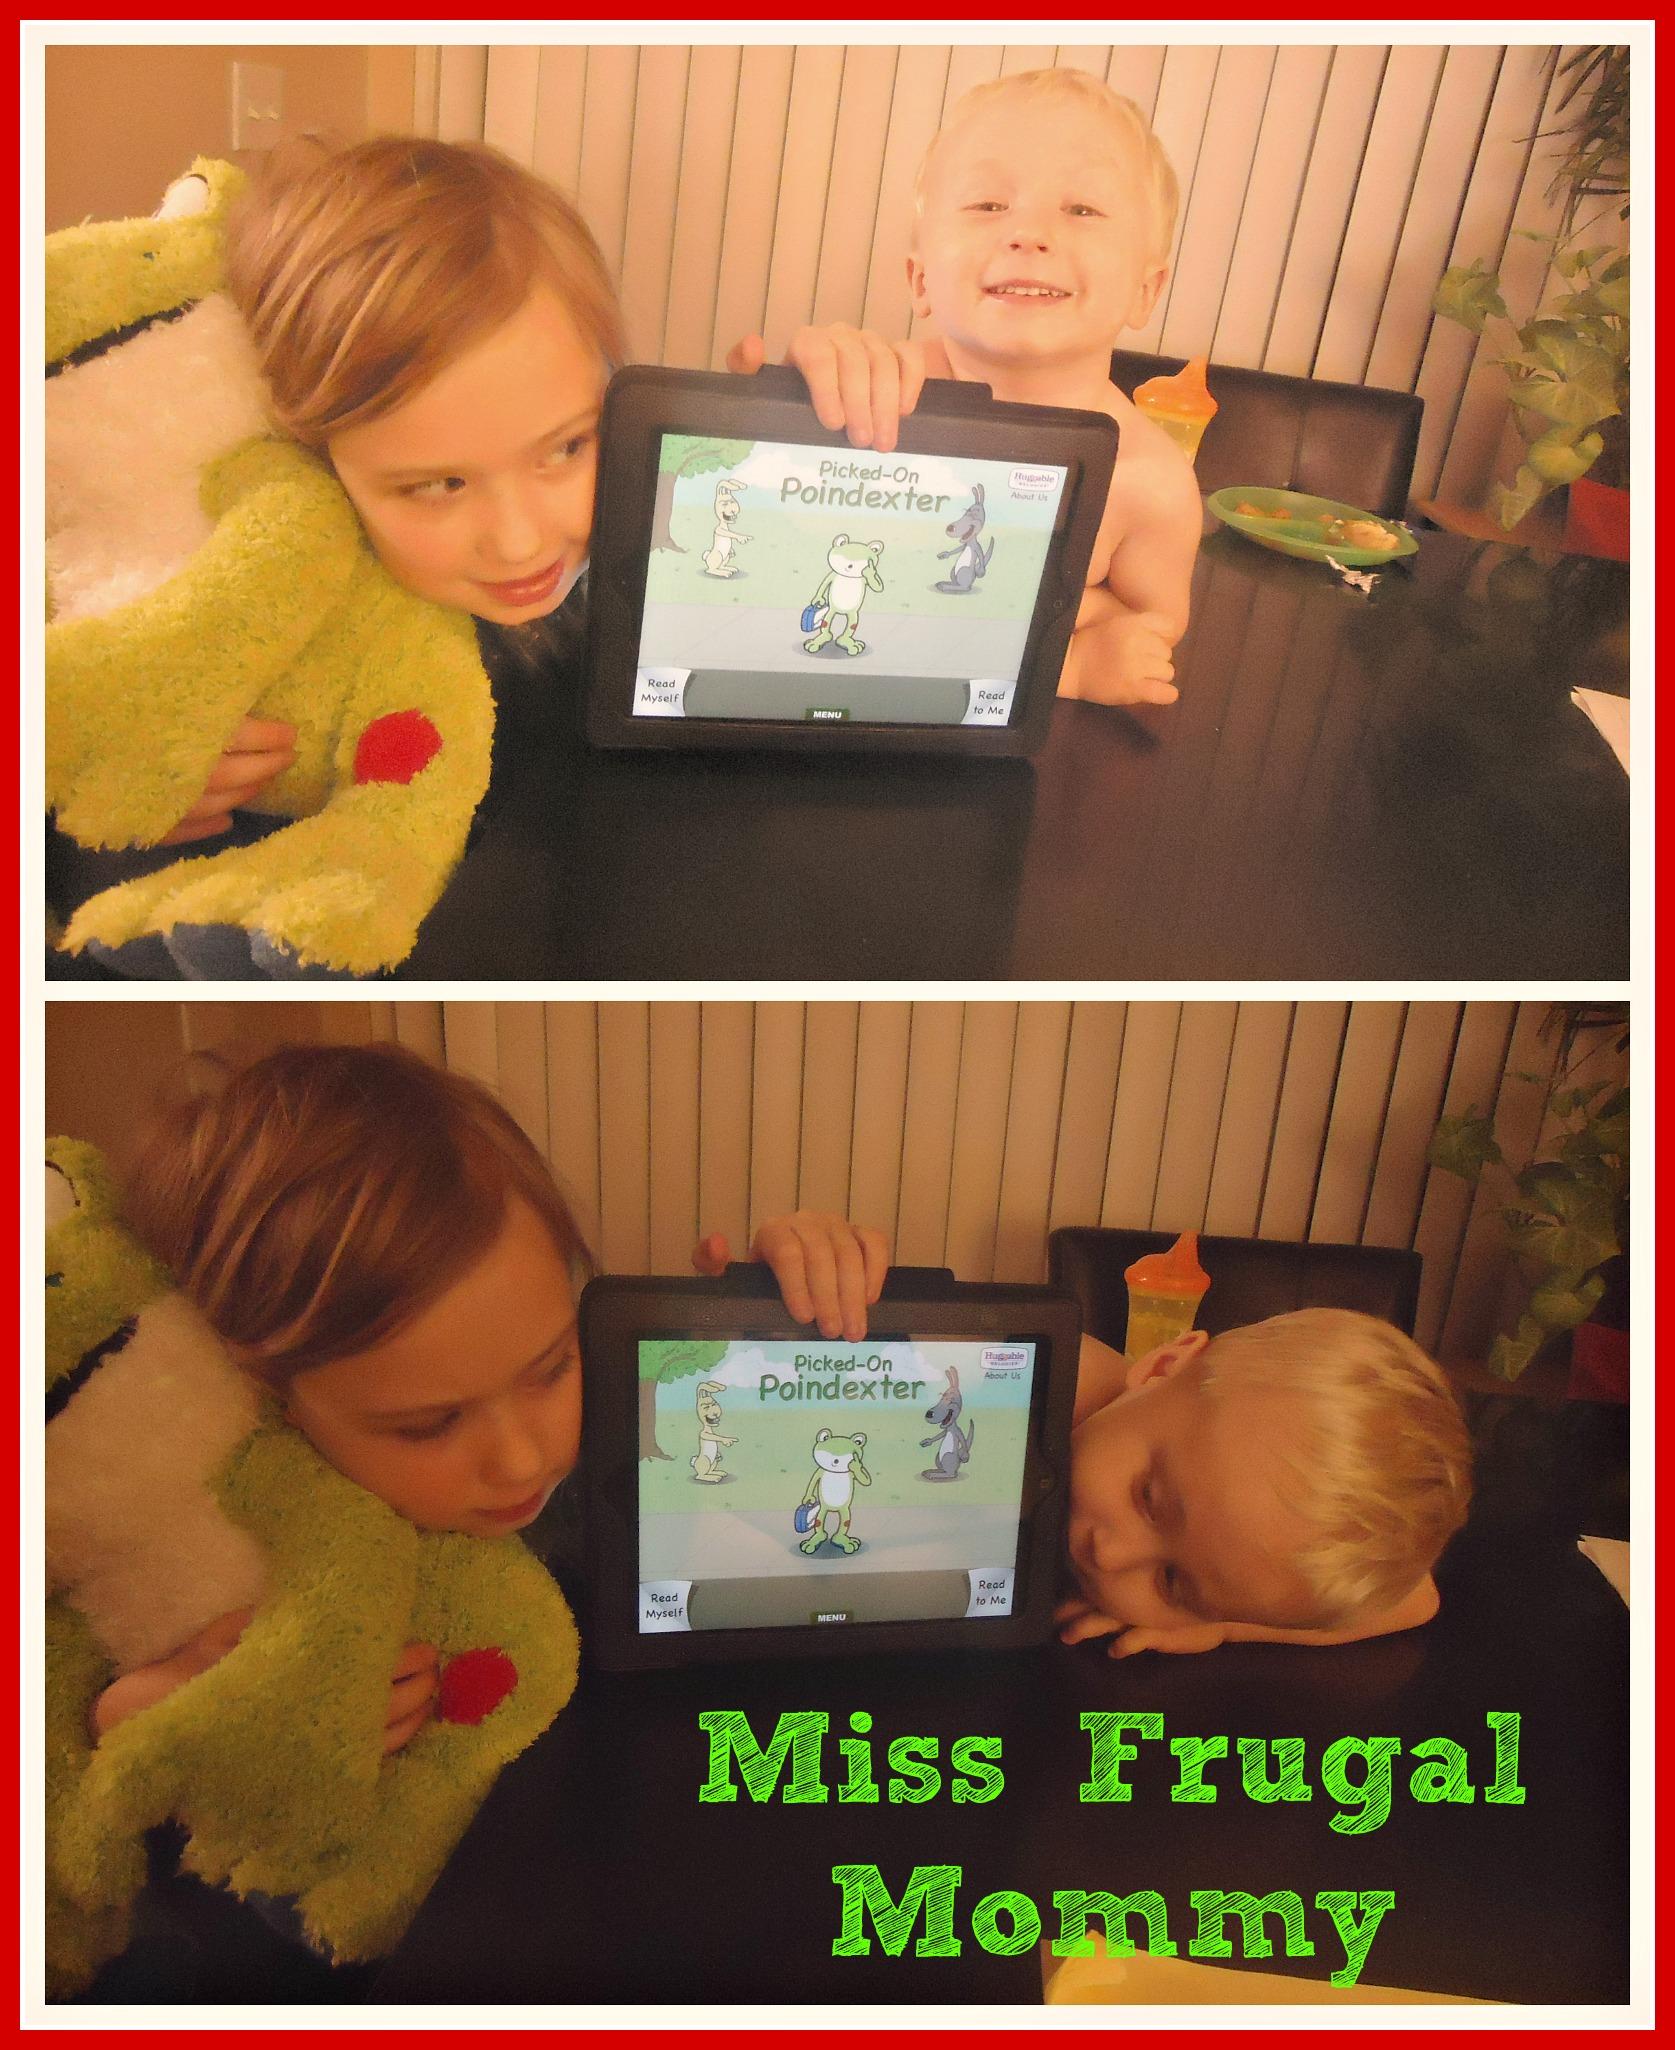 http://missfrugalmommy.com/wp-content/uploads/2013/11/poindexter-2.jpg